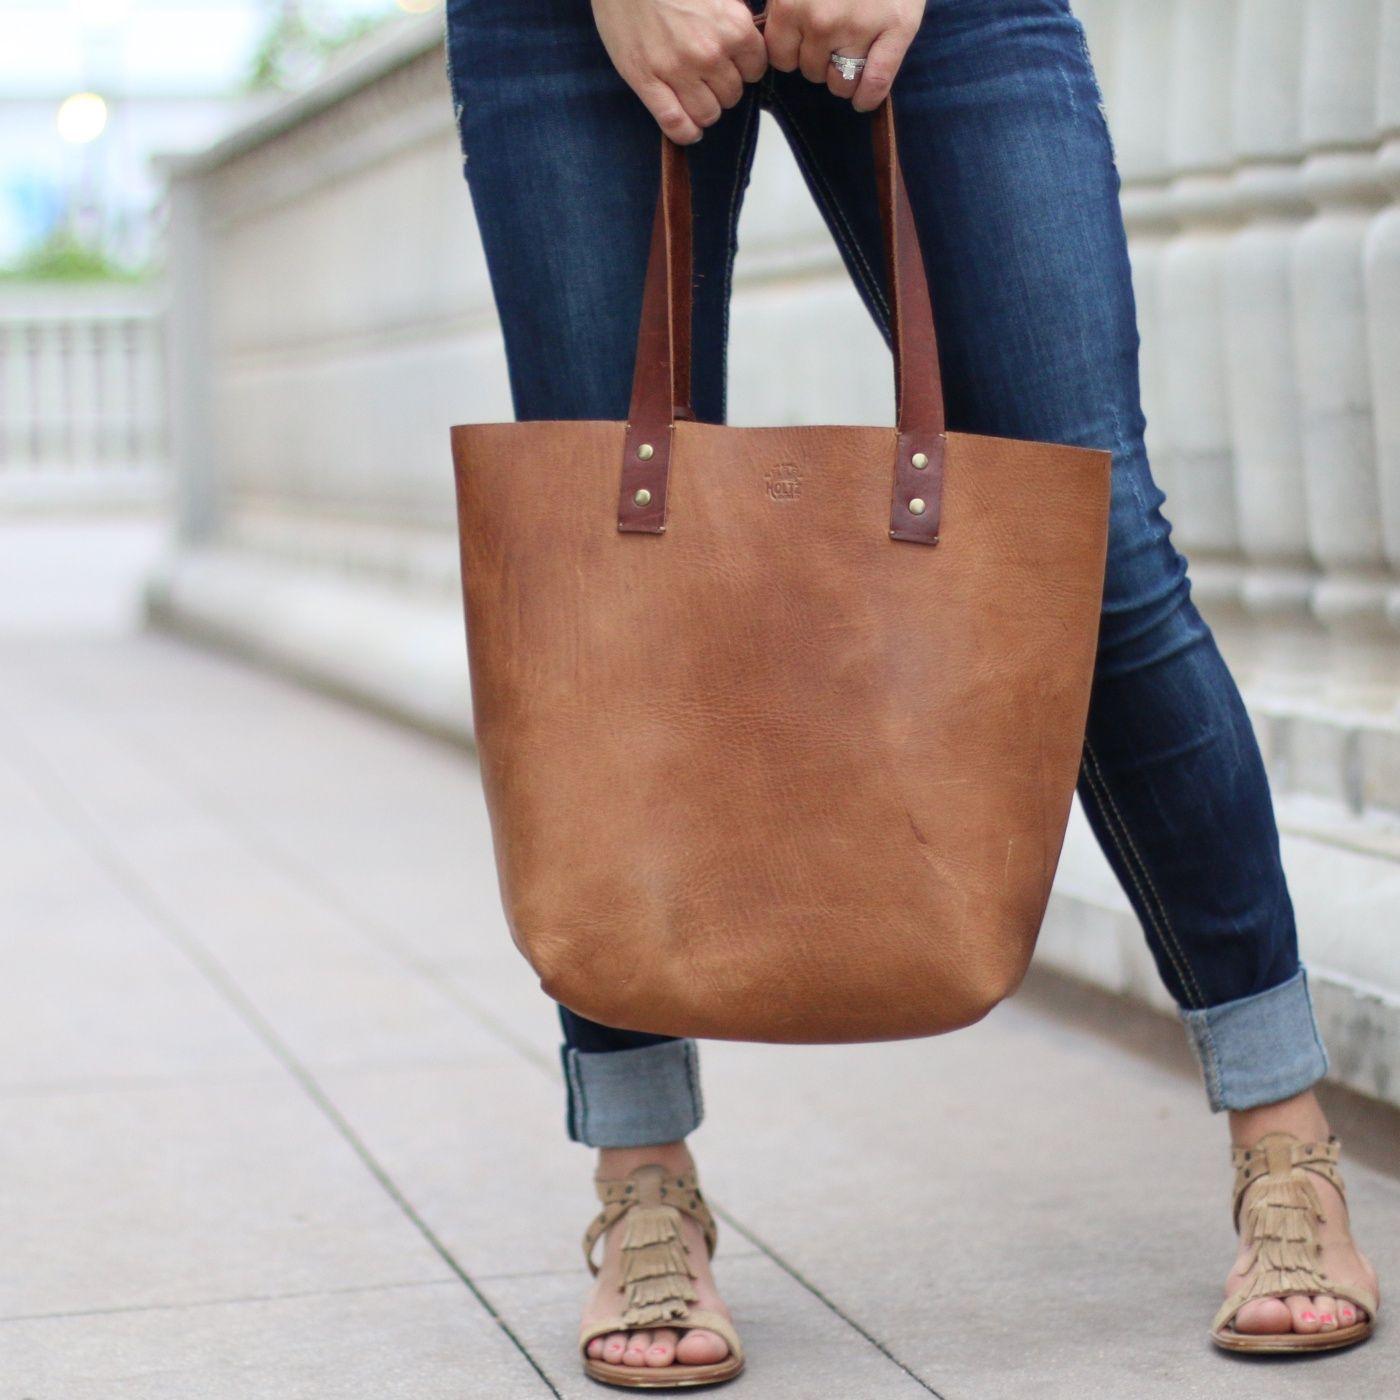 Tote Fine Leather Handbag Purse Bag